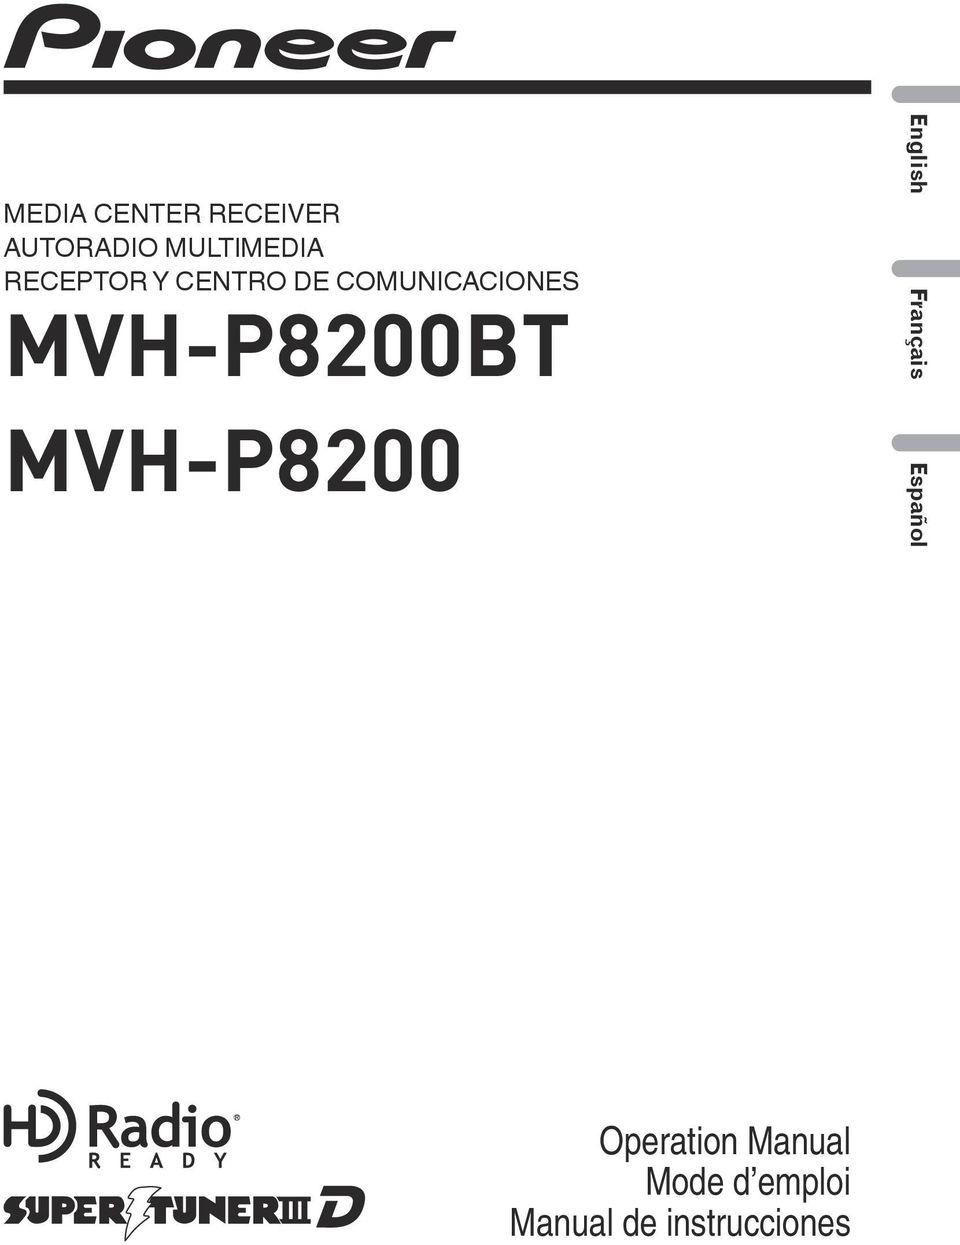 medium resolution of mvh p8200bt mvh p8200 english fran ais